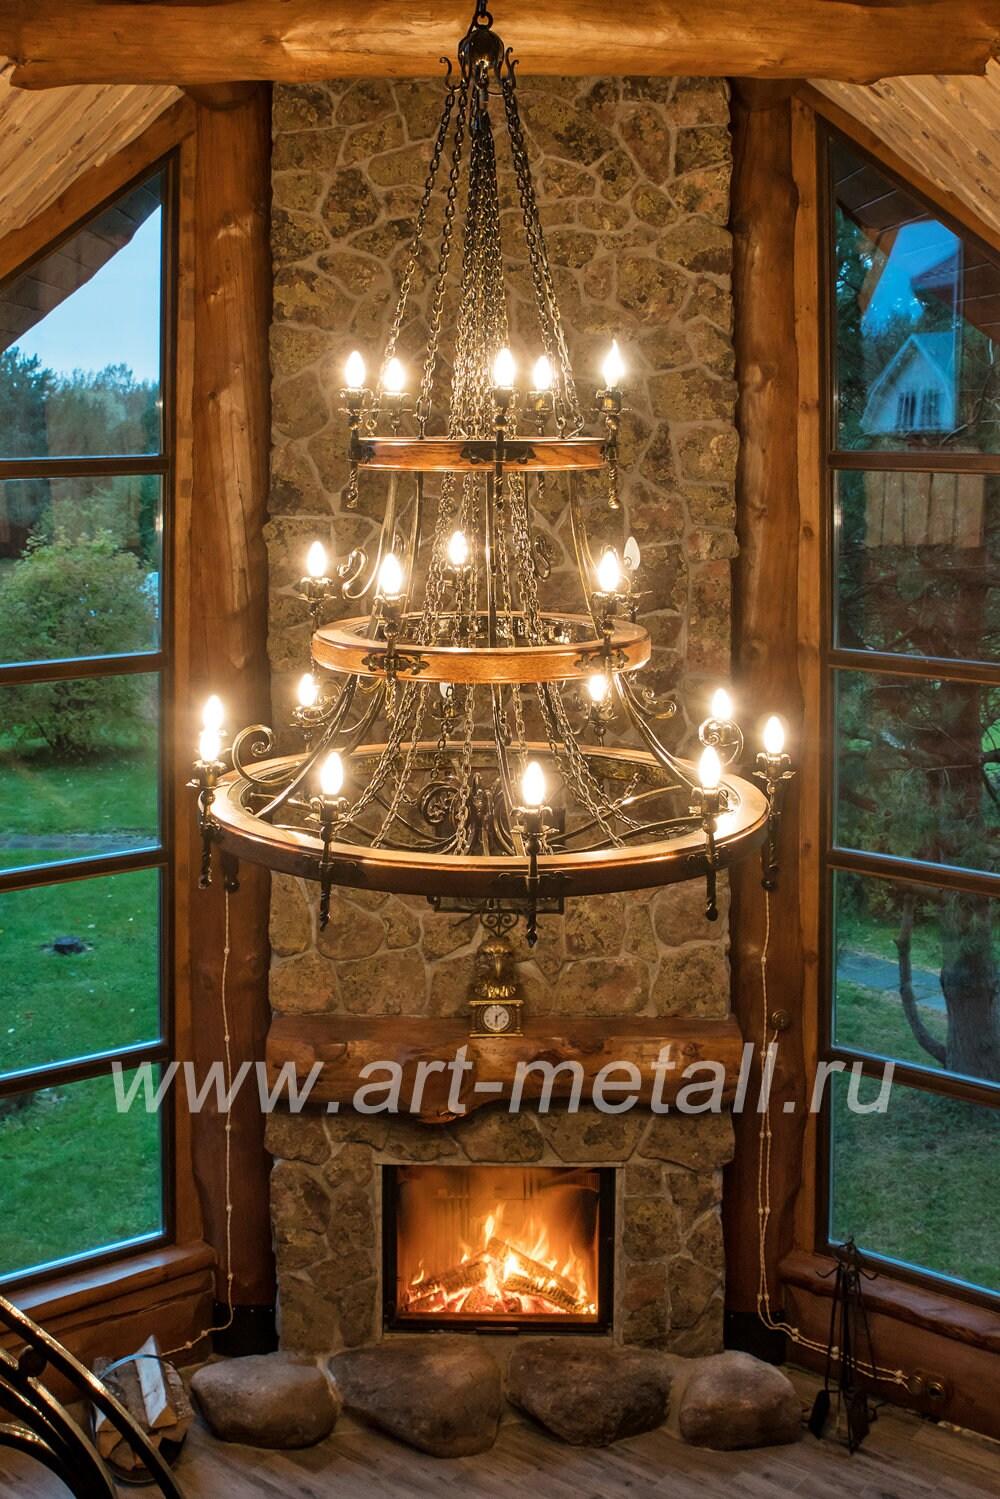 Wrought iron chandelier Wagon wheel Oak chandelier Large ceiling chandelier Hand forged chandelier Farmhouse chandelier Rustic chandelier .